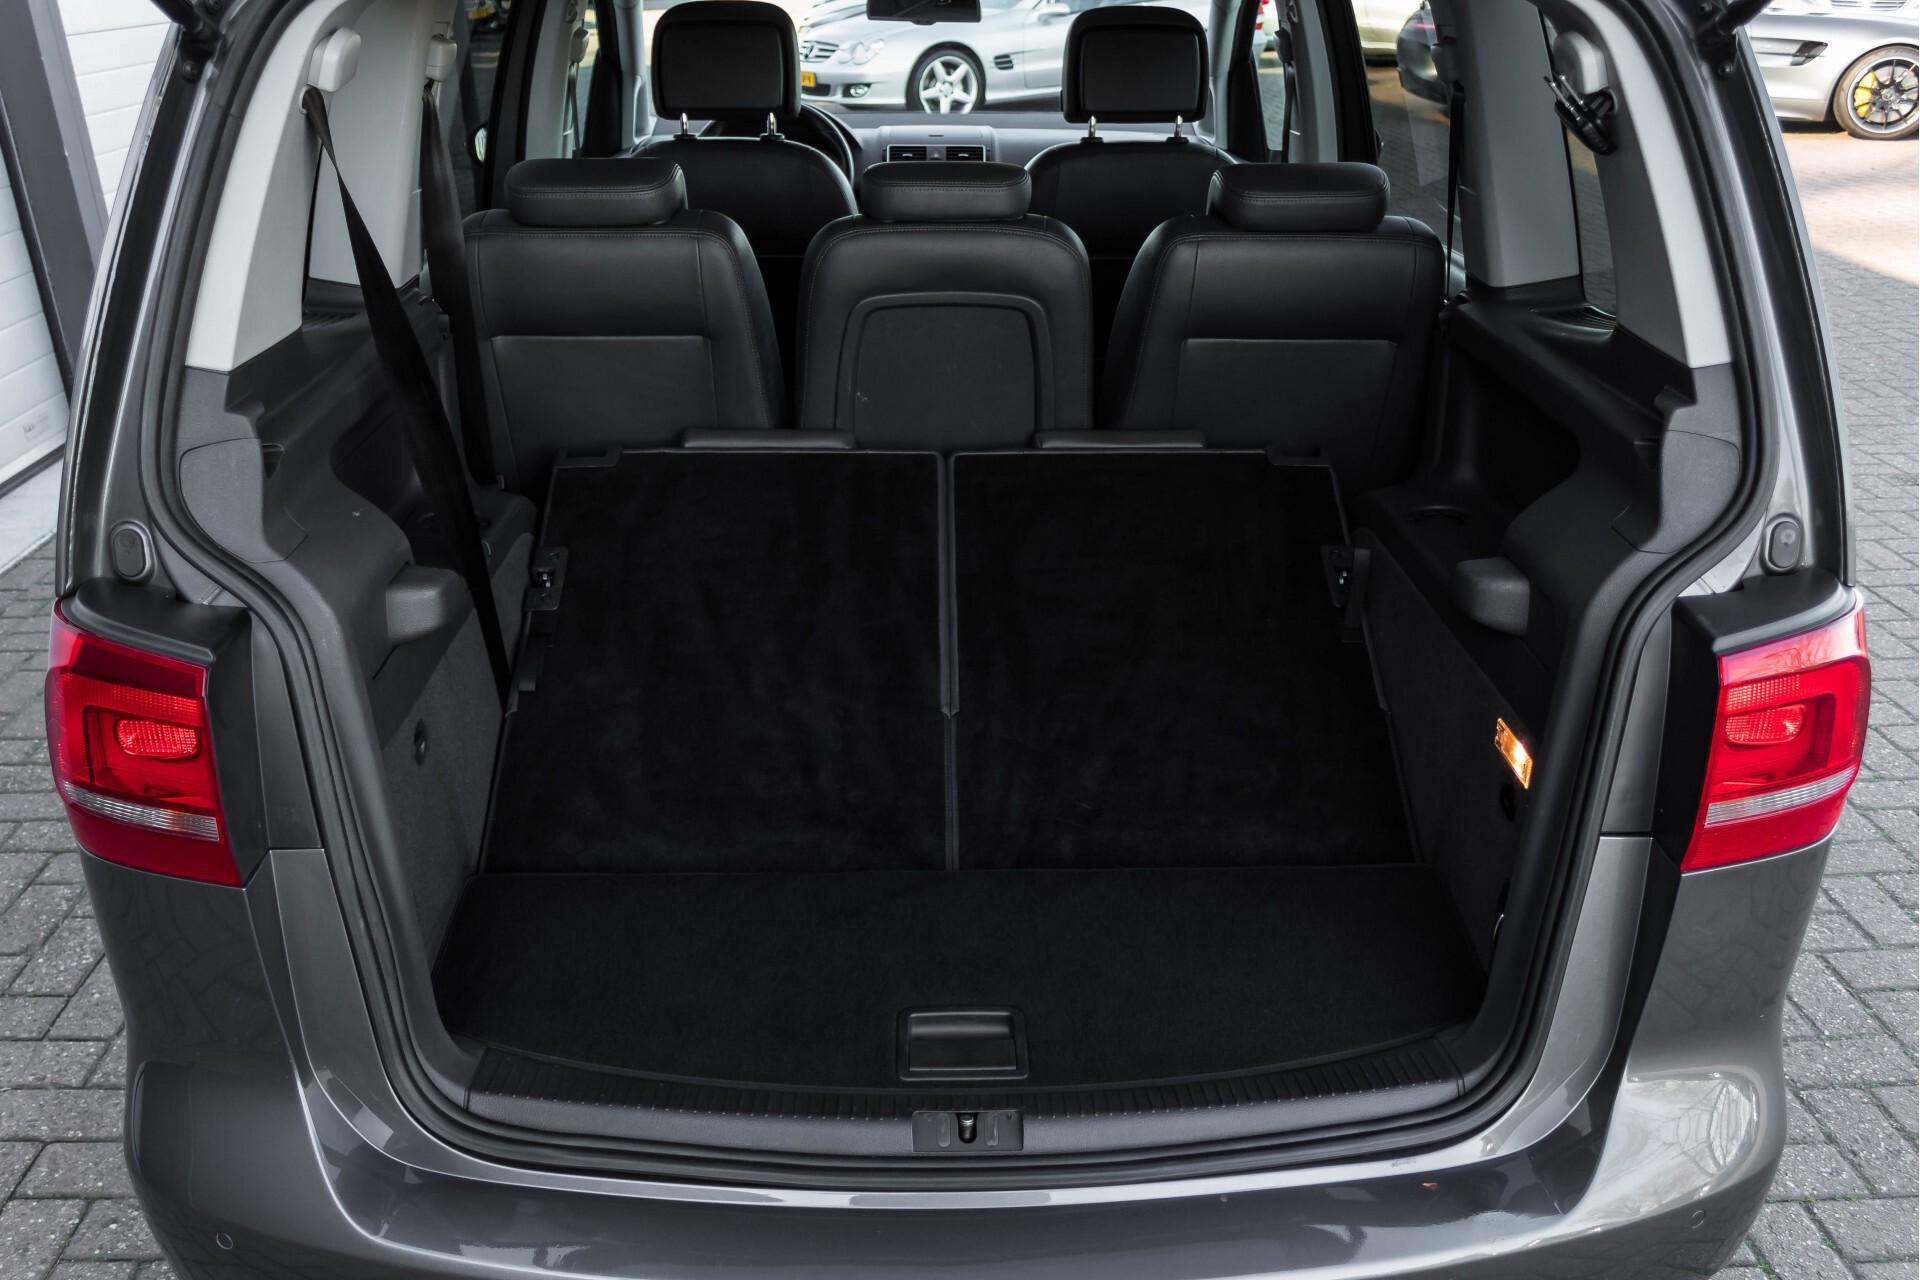 Volkswagen Touran 2.0 TDI Highline 7Persoons 177pk Panorama/Leder/Navi/Camera/Verw-Stln/Trhk/ECC/Xenon Aut Foto 40